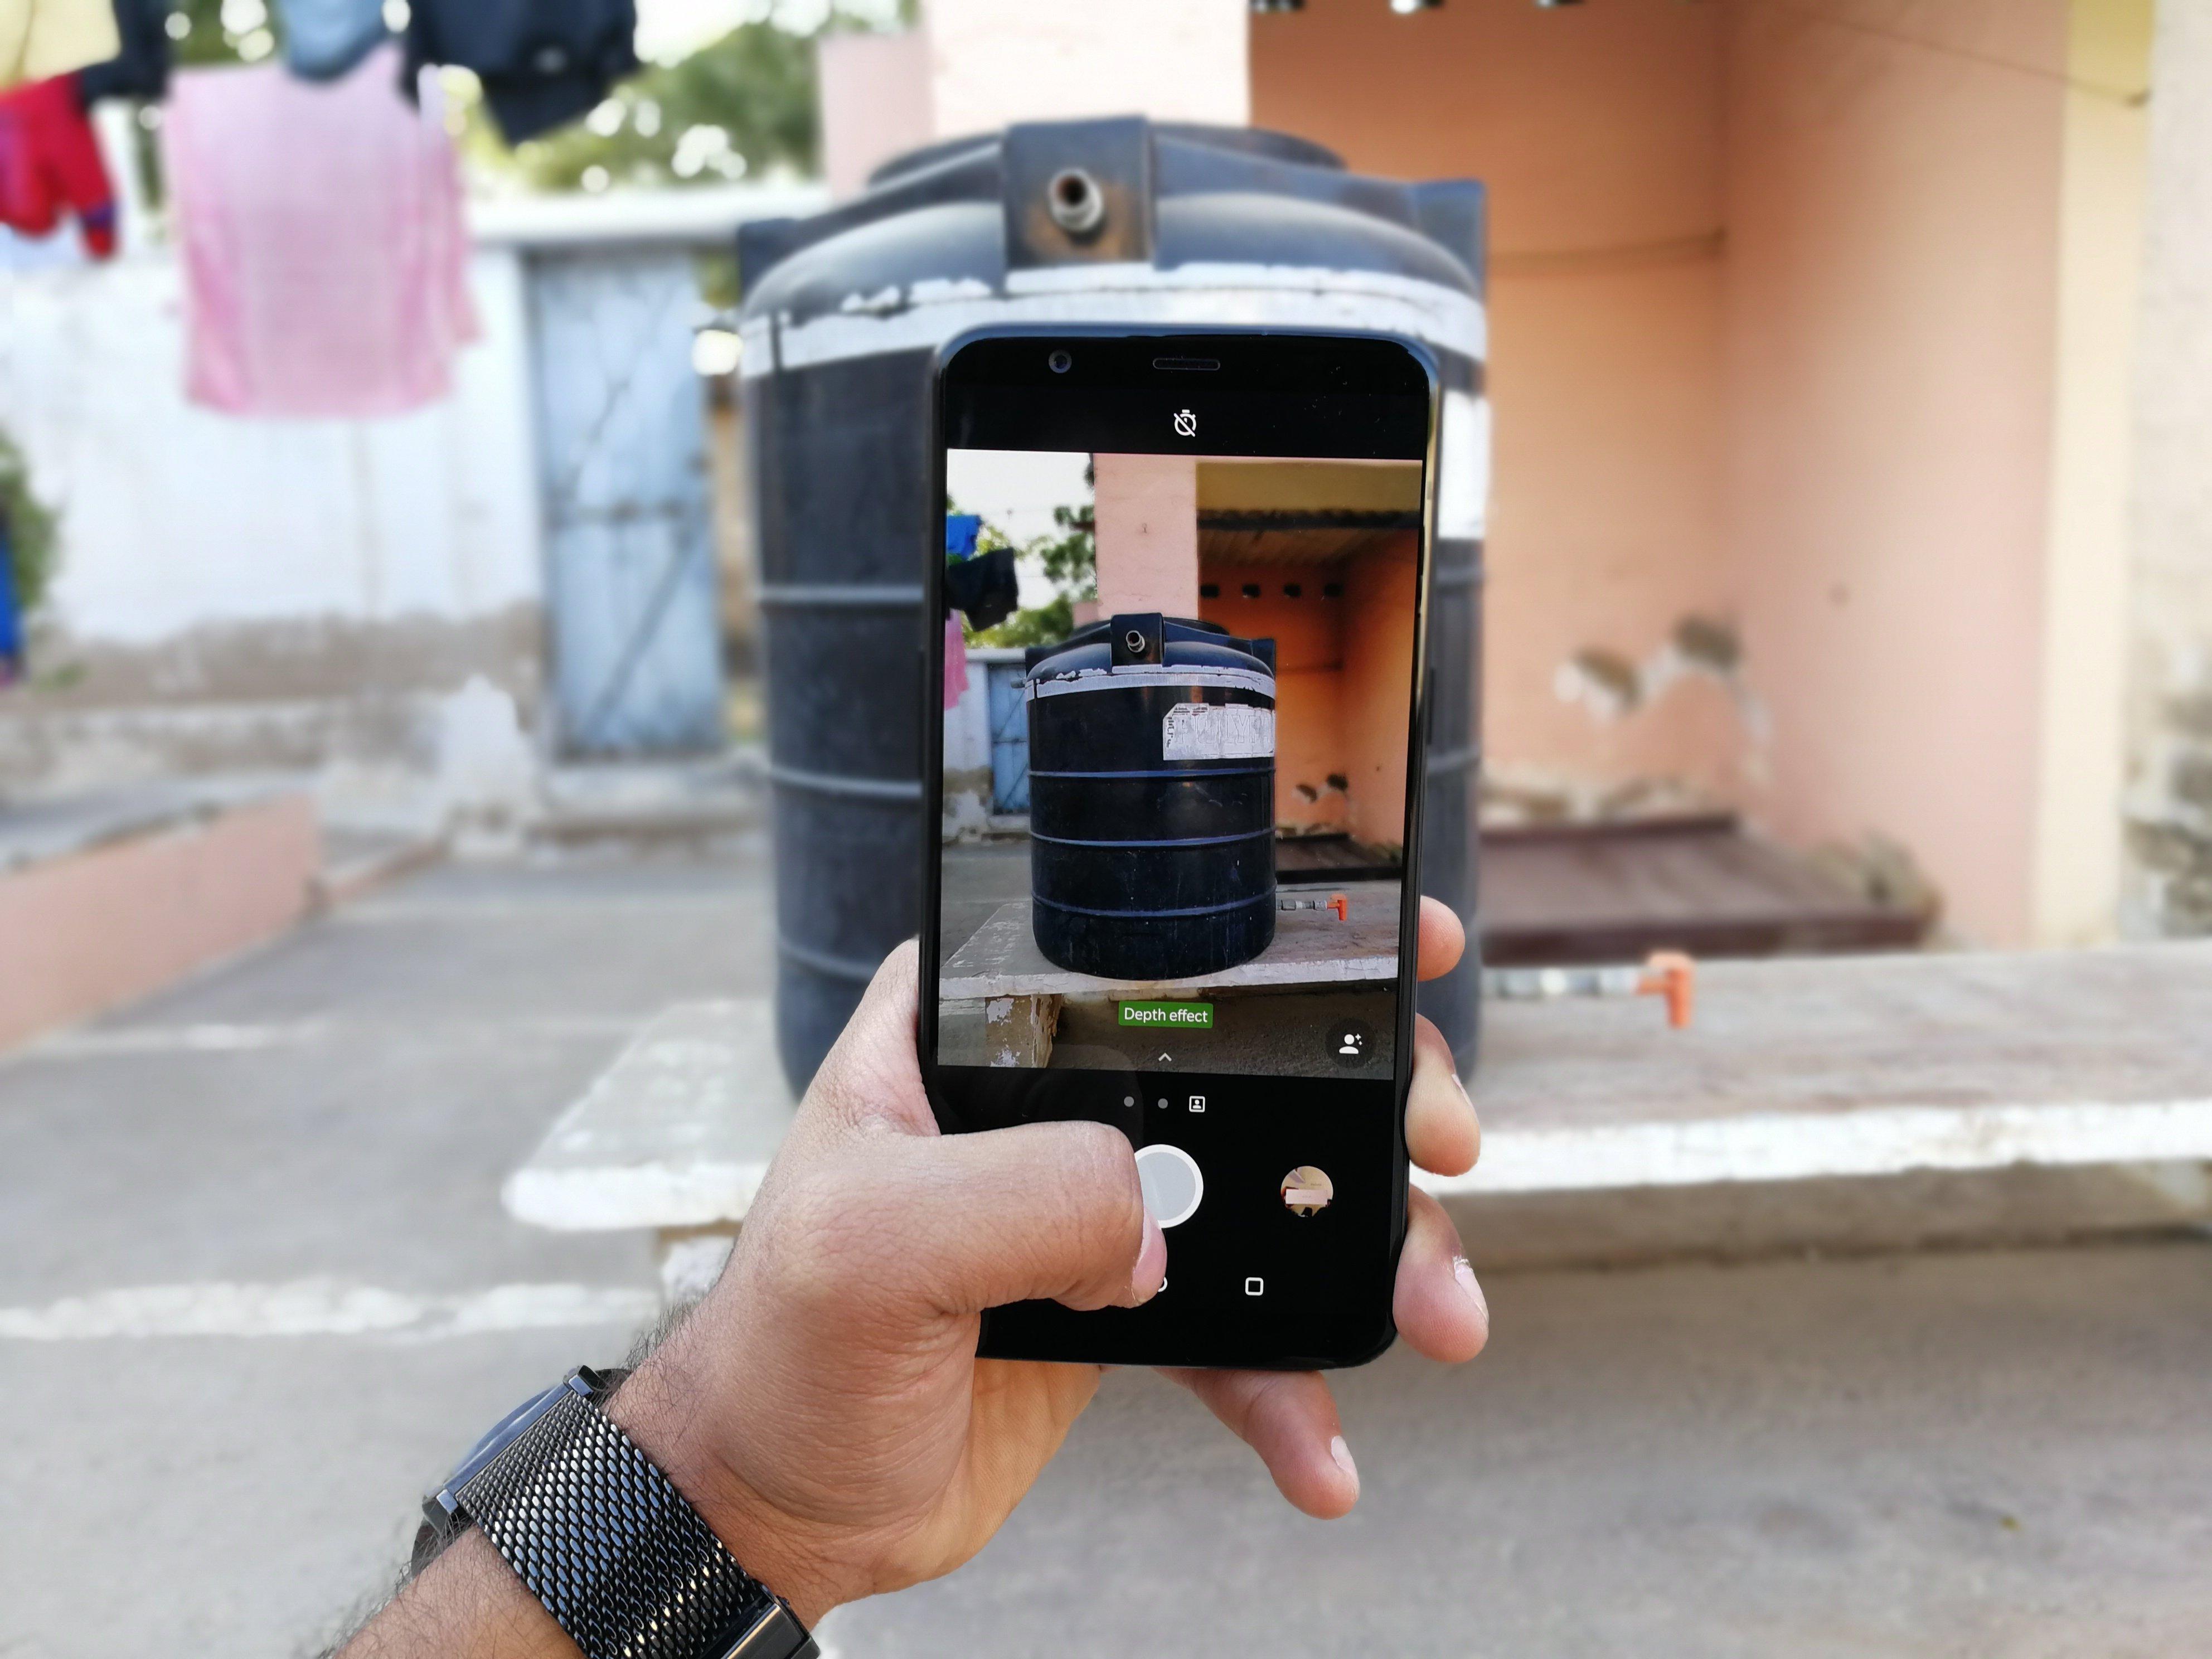 OnePlus 5T 10 1